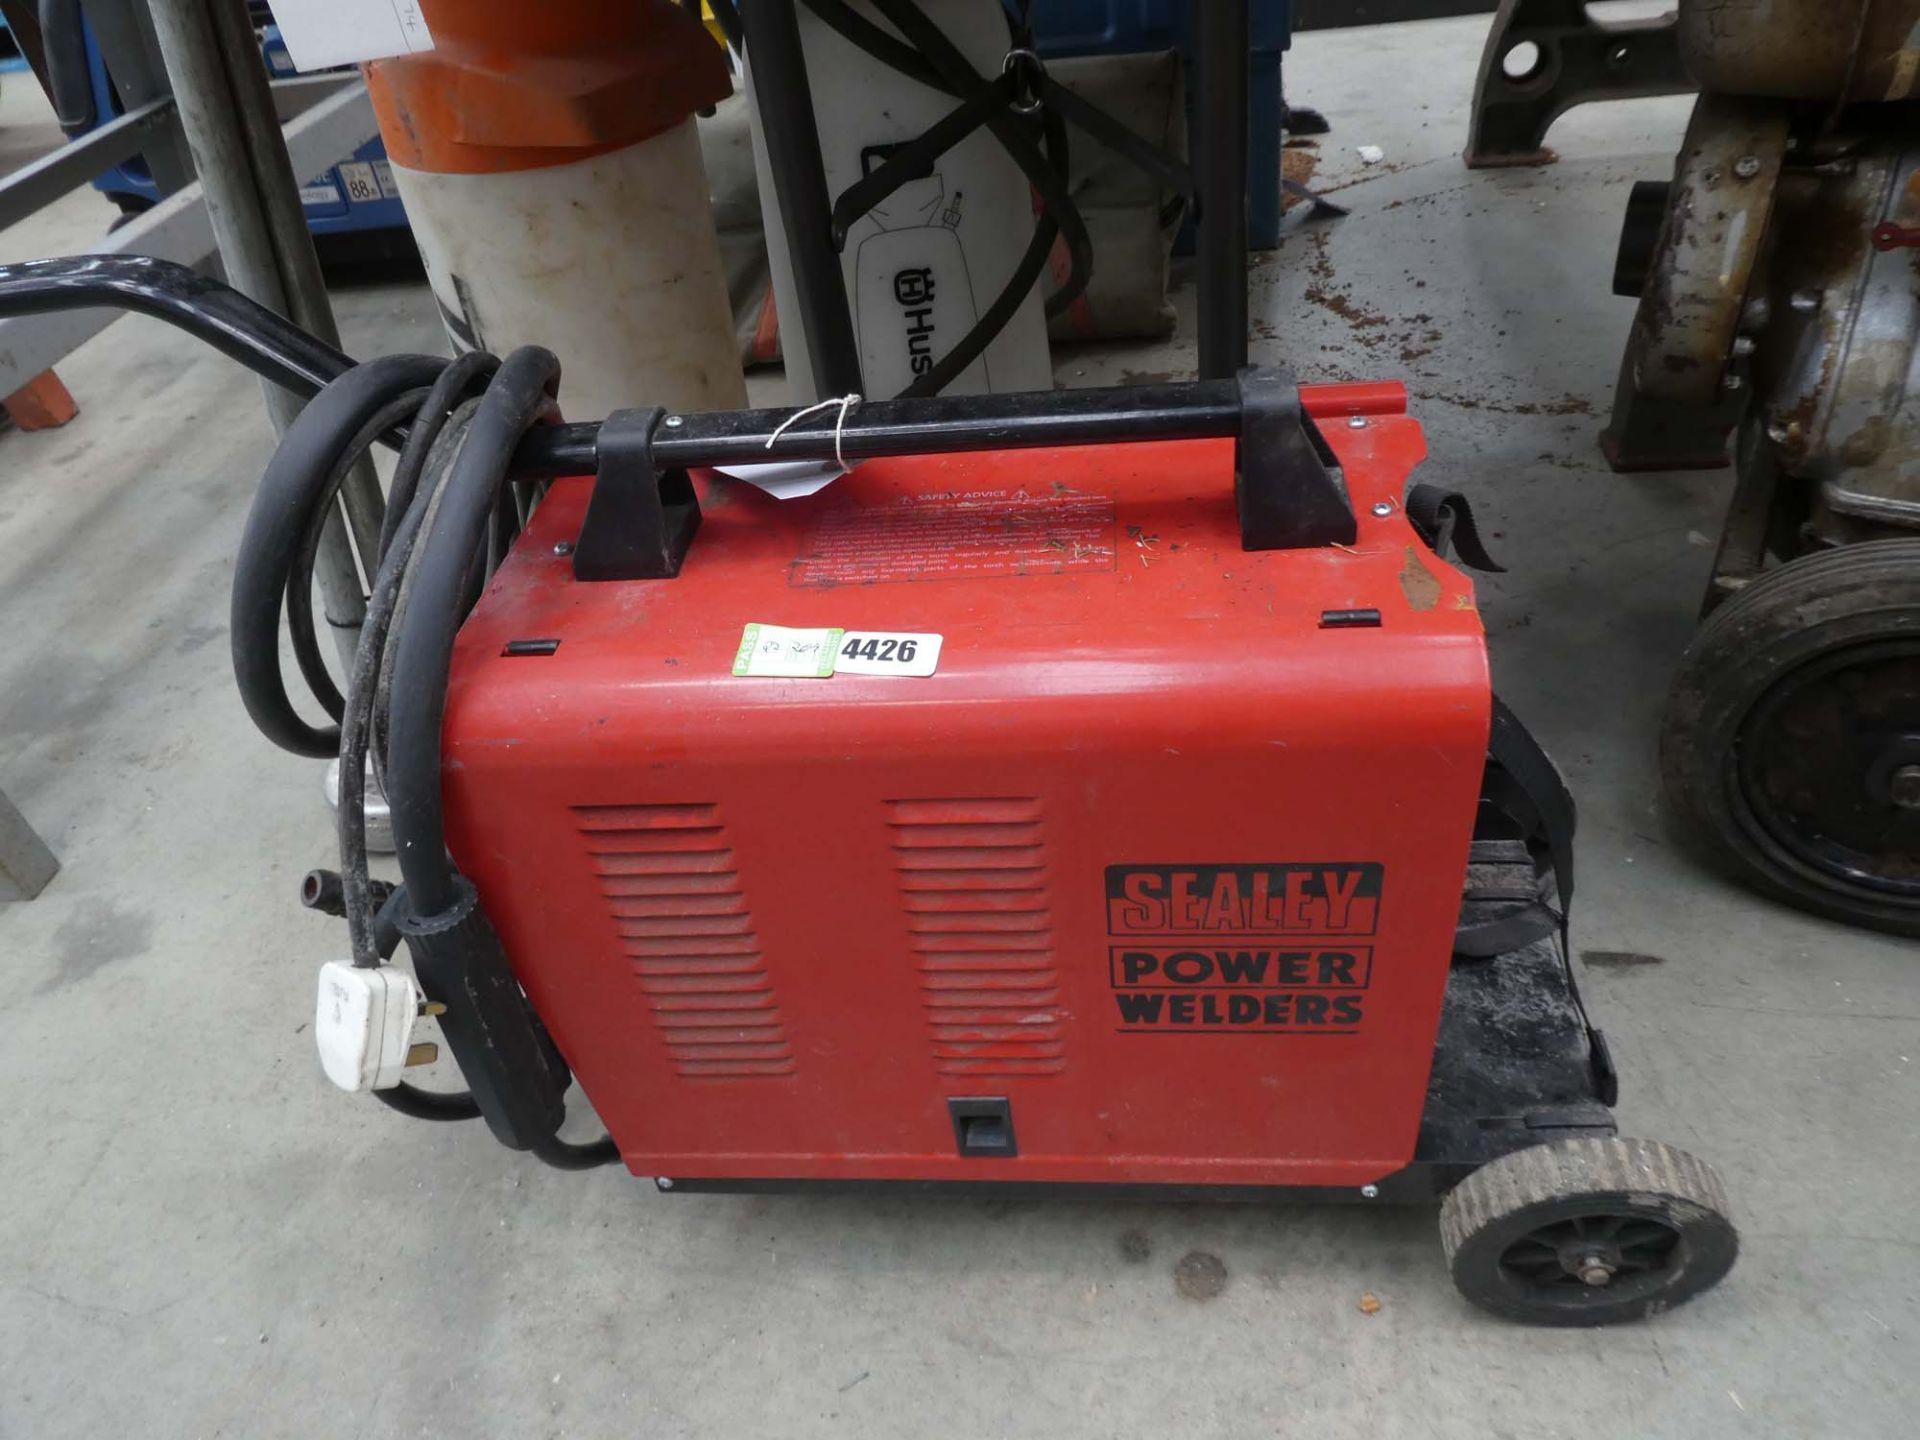 Sealey Mighty Mig 150 welder